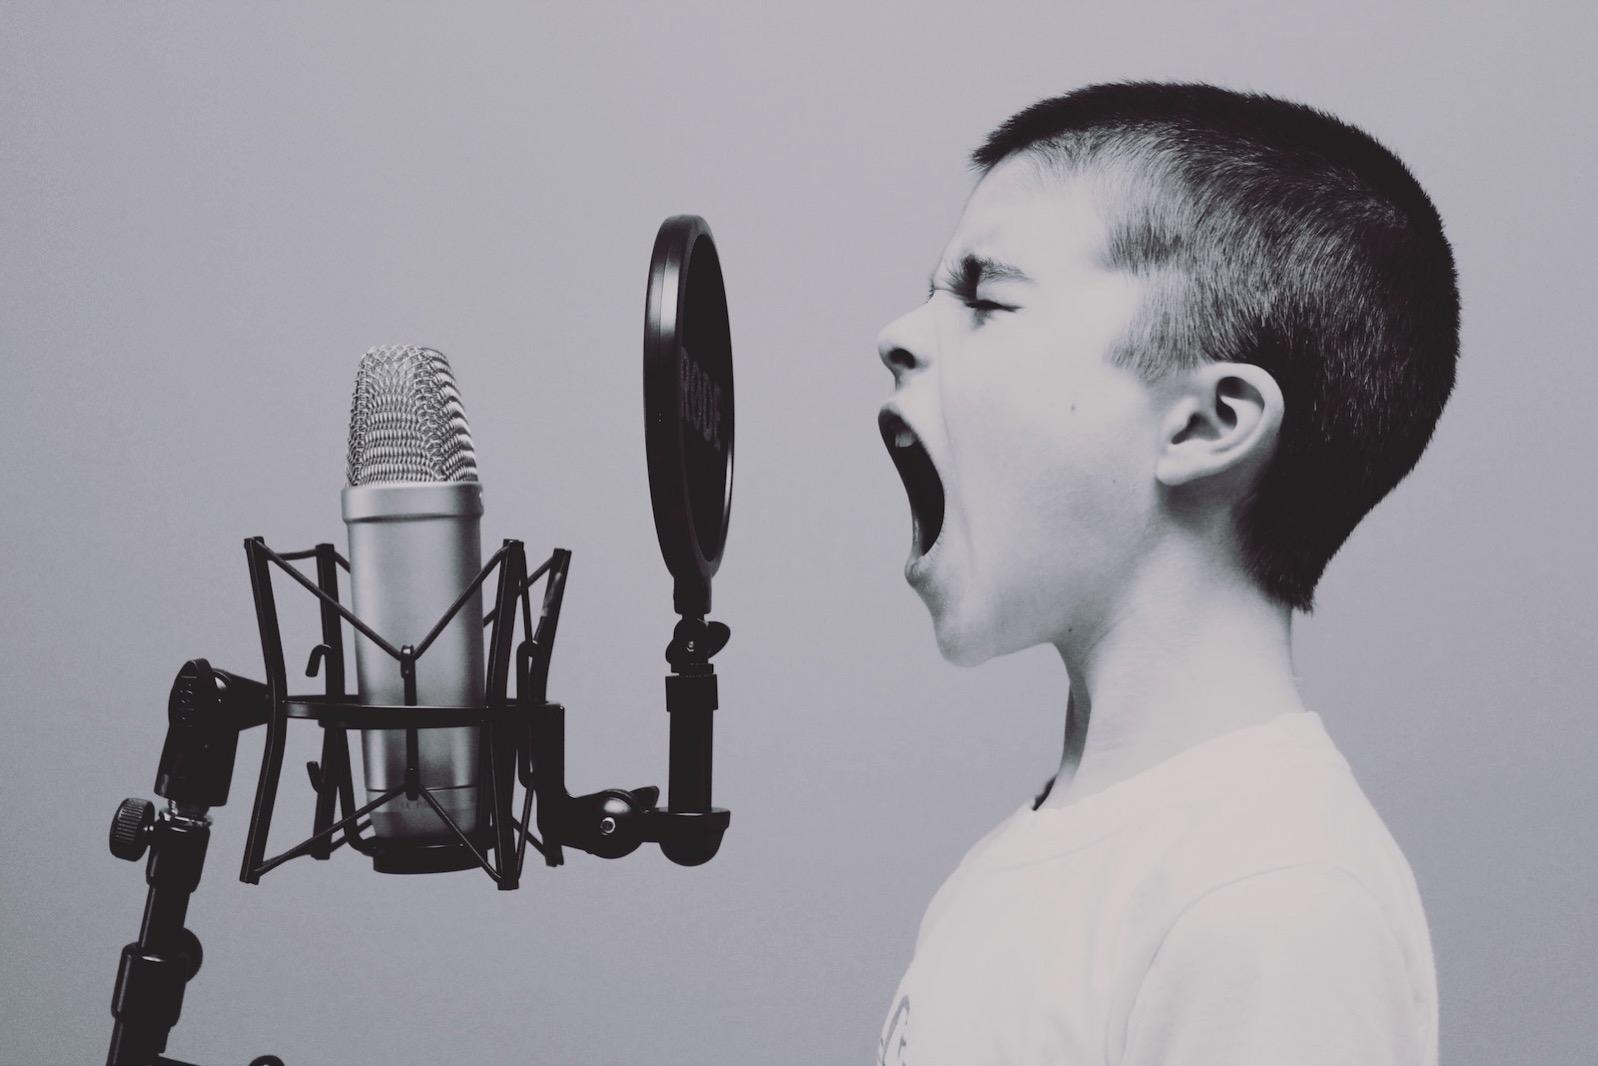 jason-rosewell-60014-karaoke-boy.jpg